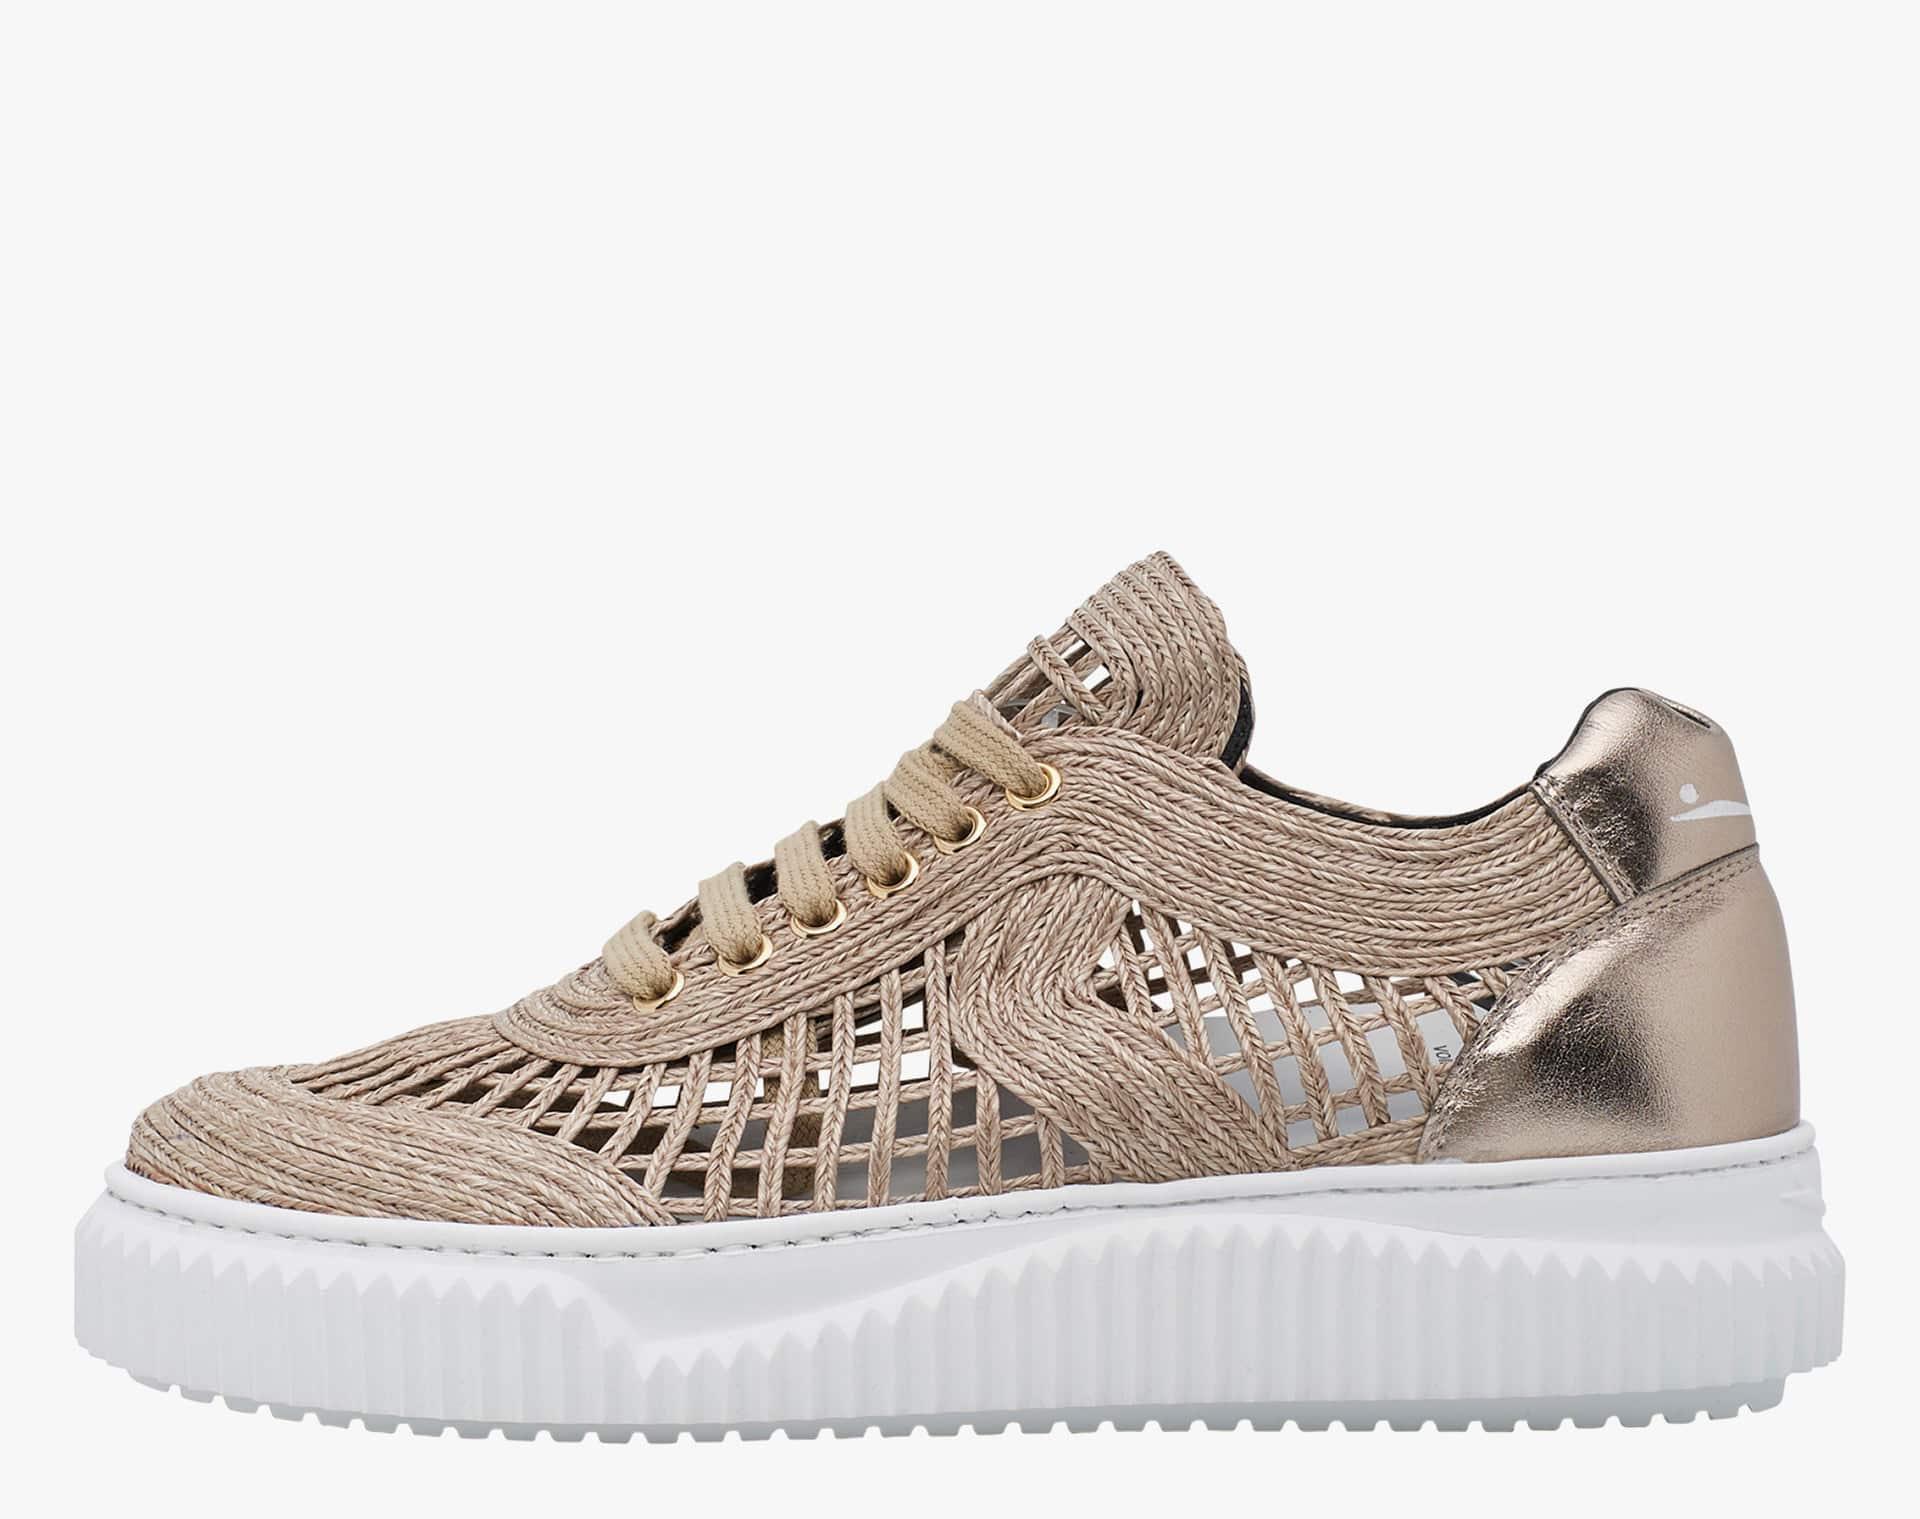 Sneaker in rafia con dettagli laminati Beige-MAIORCA BIS